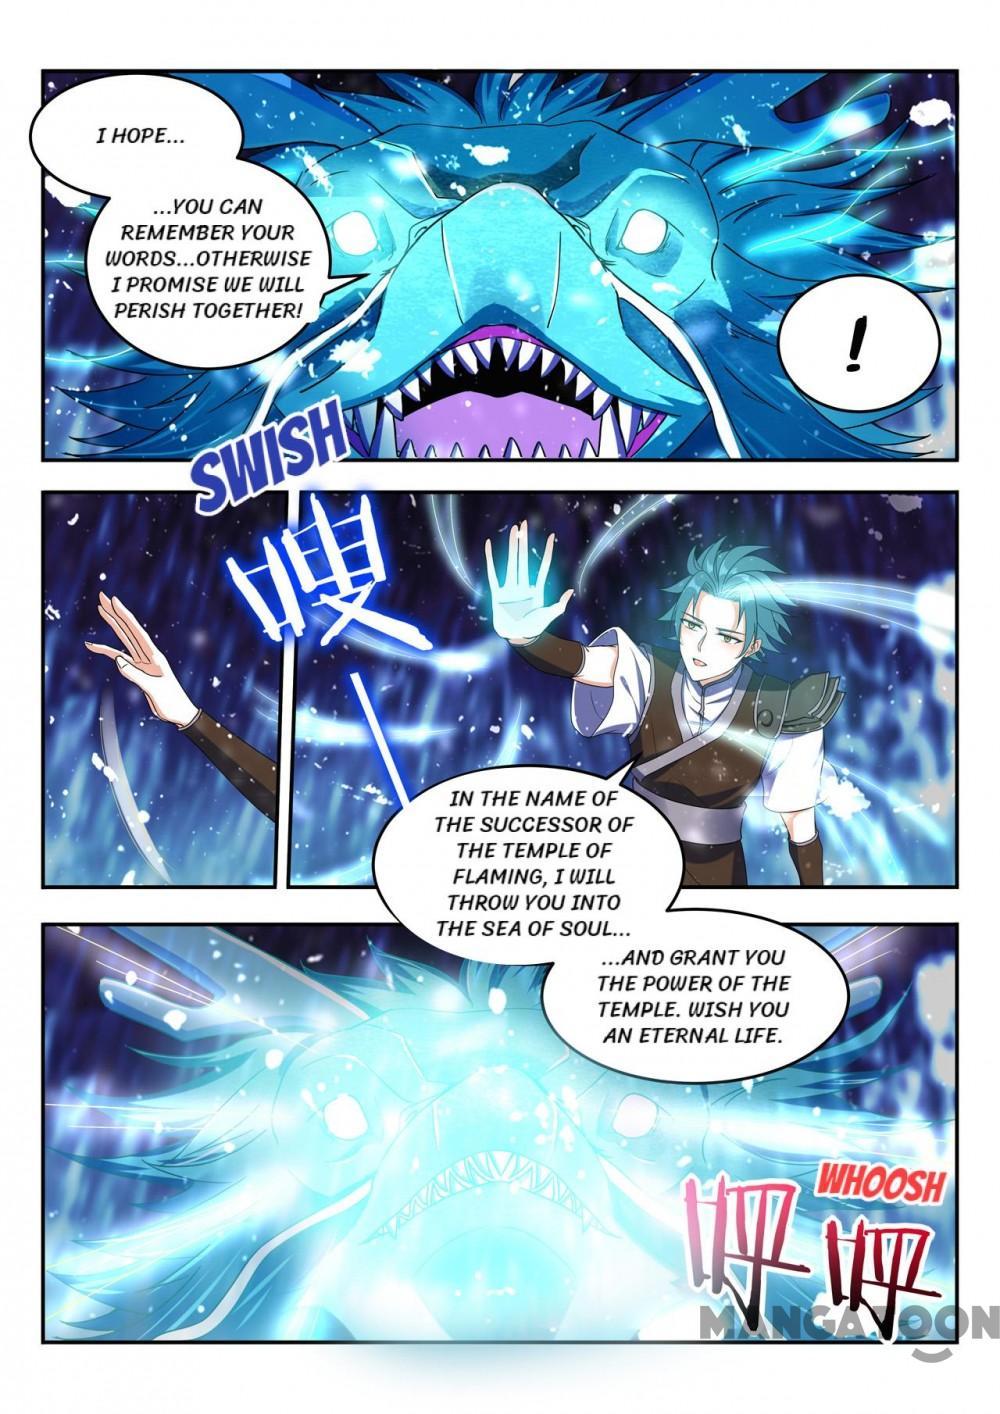 https://img2.nineanime.com/comics/pic2/25/27417/969523/b81f28ca59f62bff14cb153be5c46623.jpg Page 1